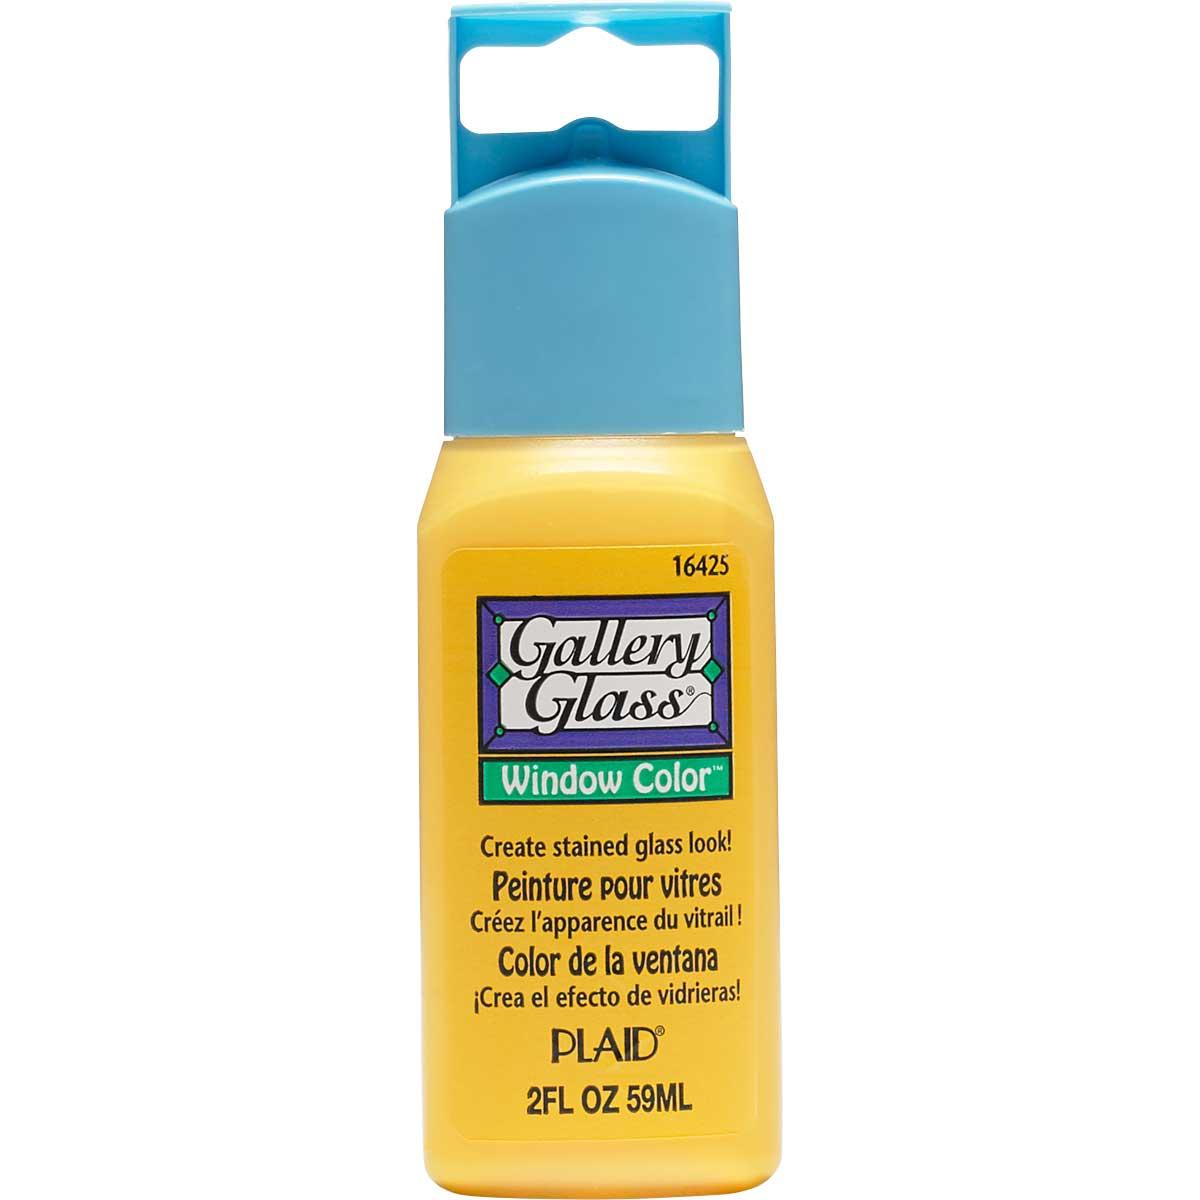 Gallery Glass ® Window Color™ - Citrus Yellow, 2 oz. - 16425